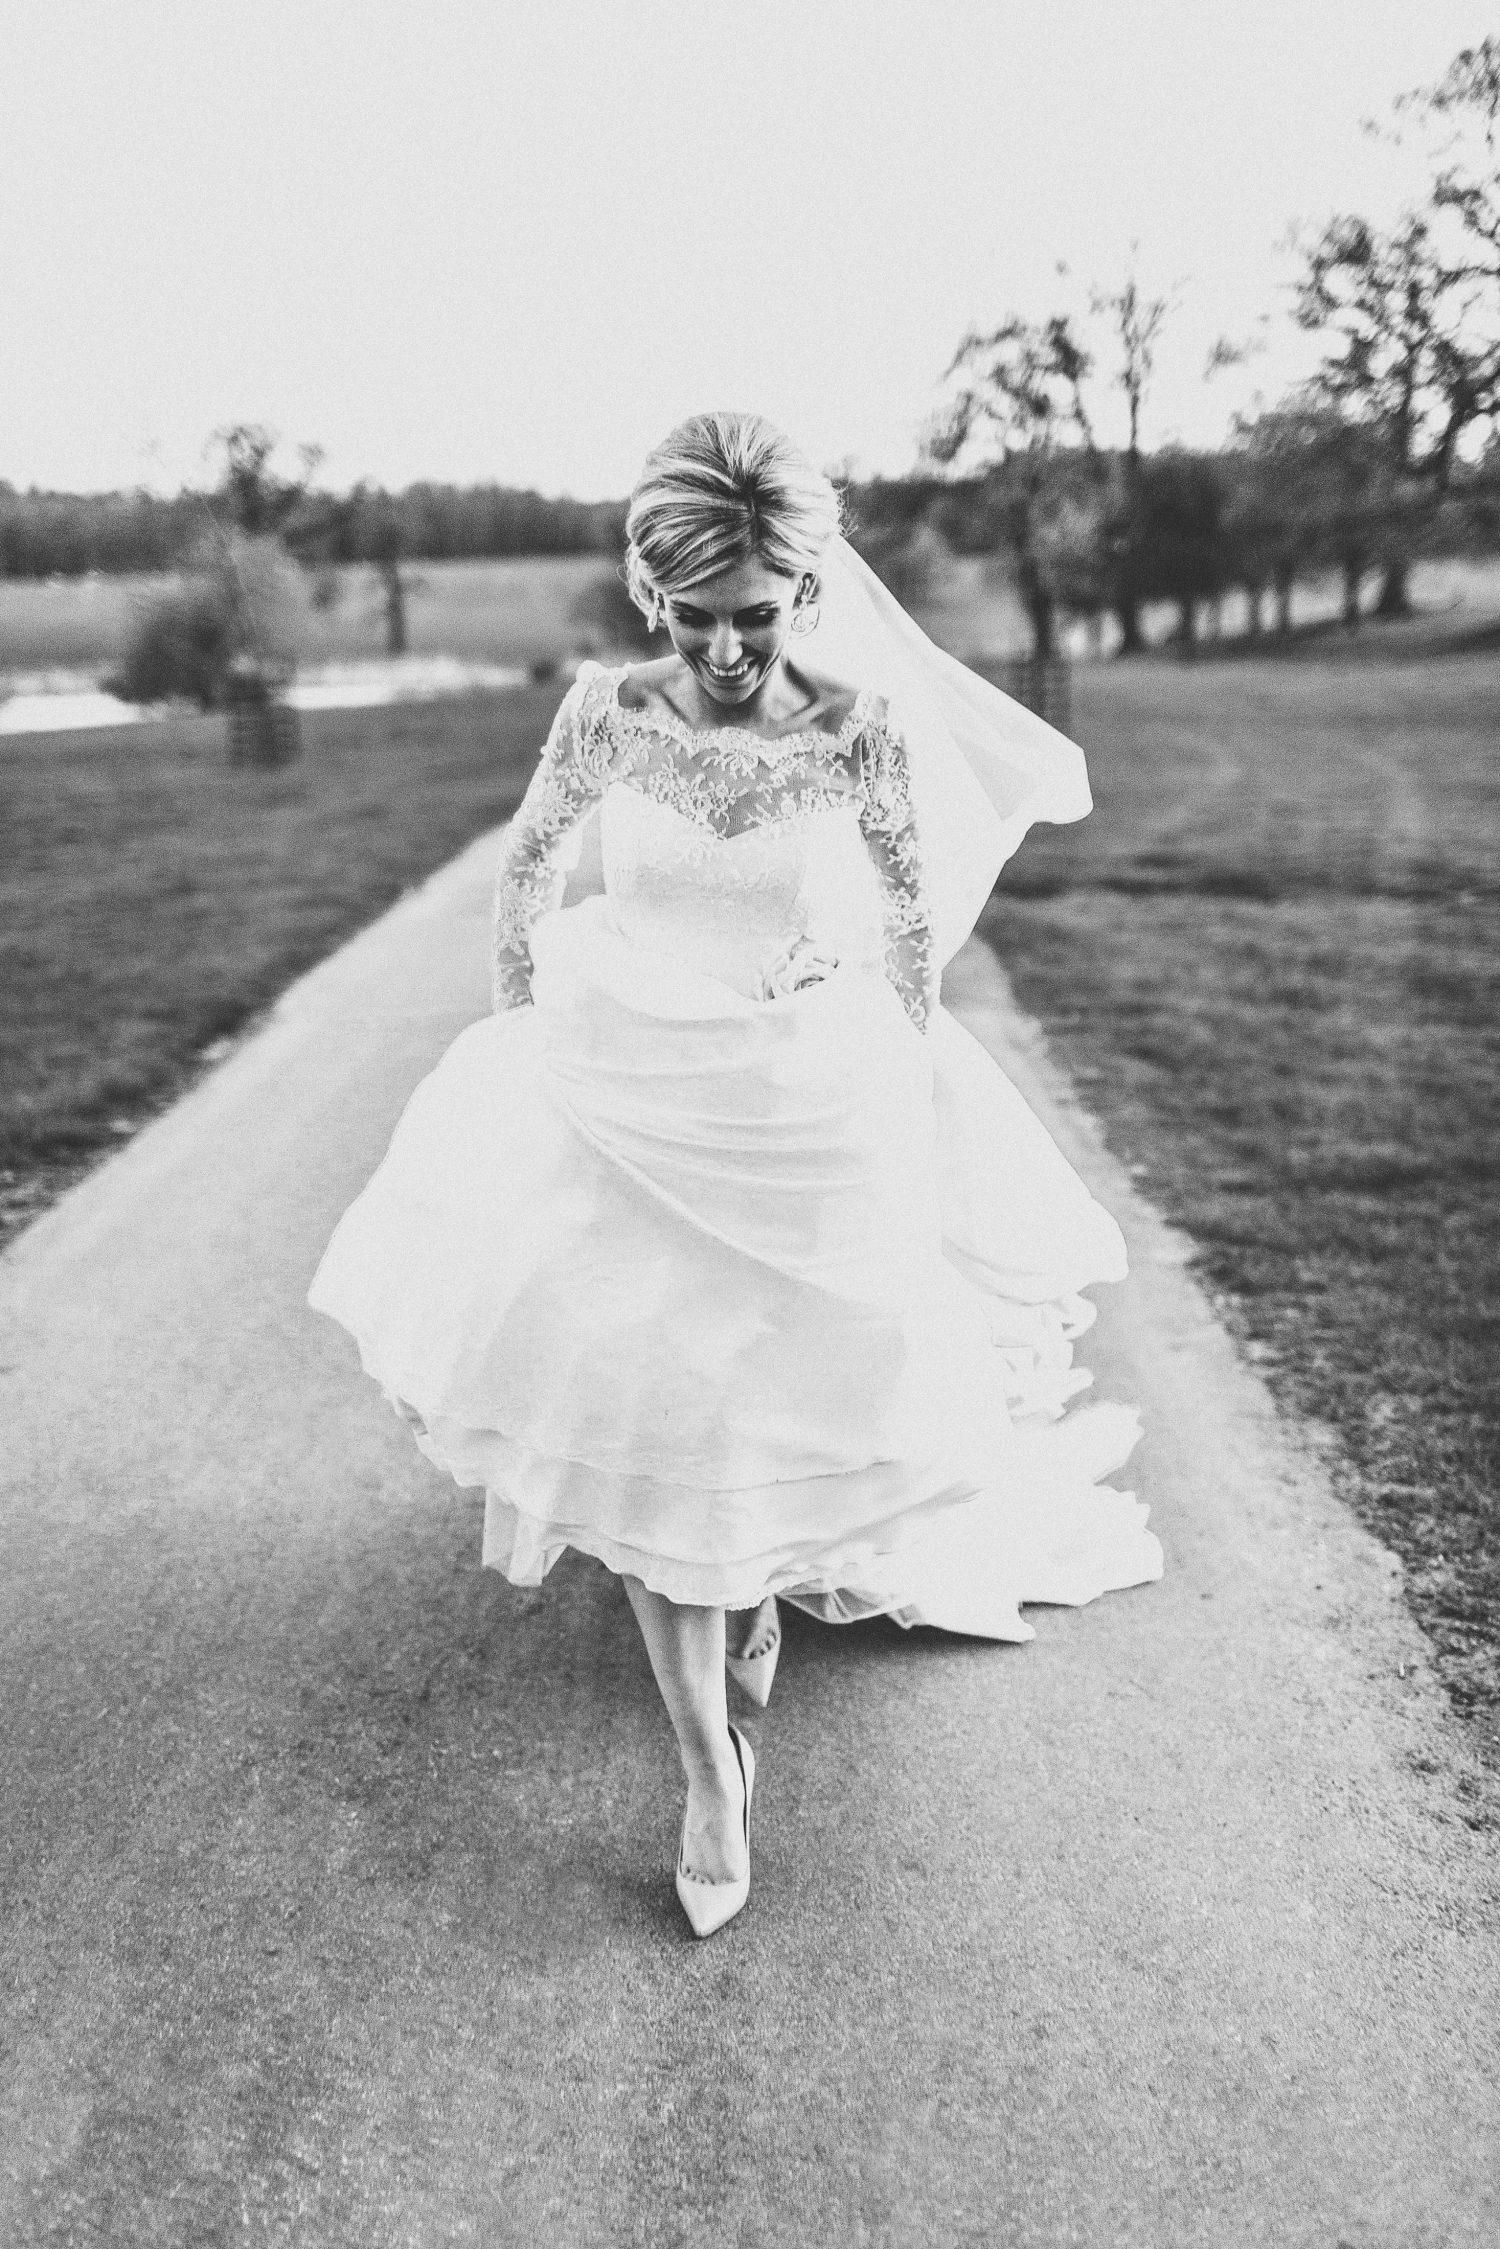 Real Bride Naomi wears Fleur by Naomi Neoh - Bride walking - Black & White